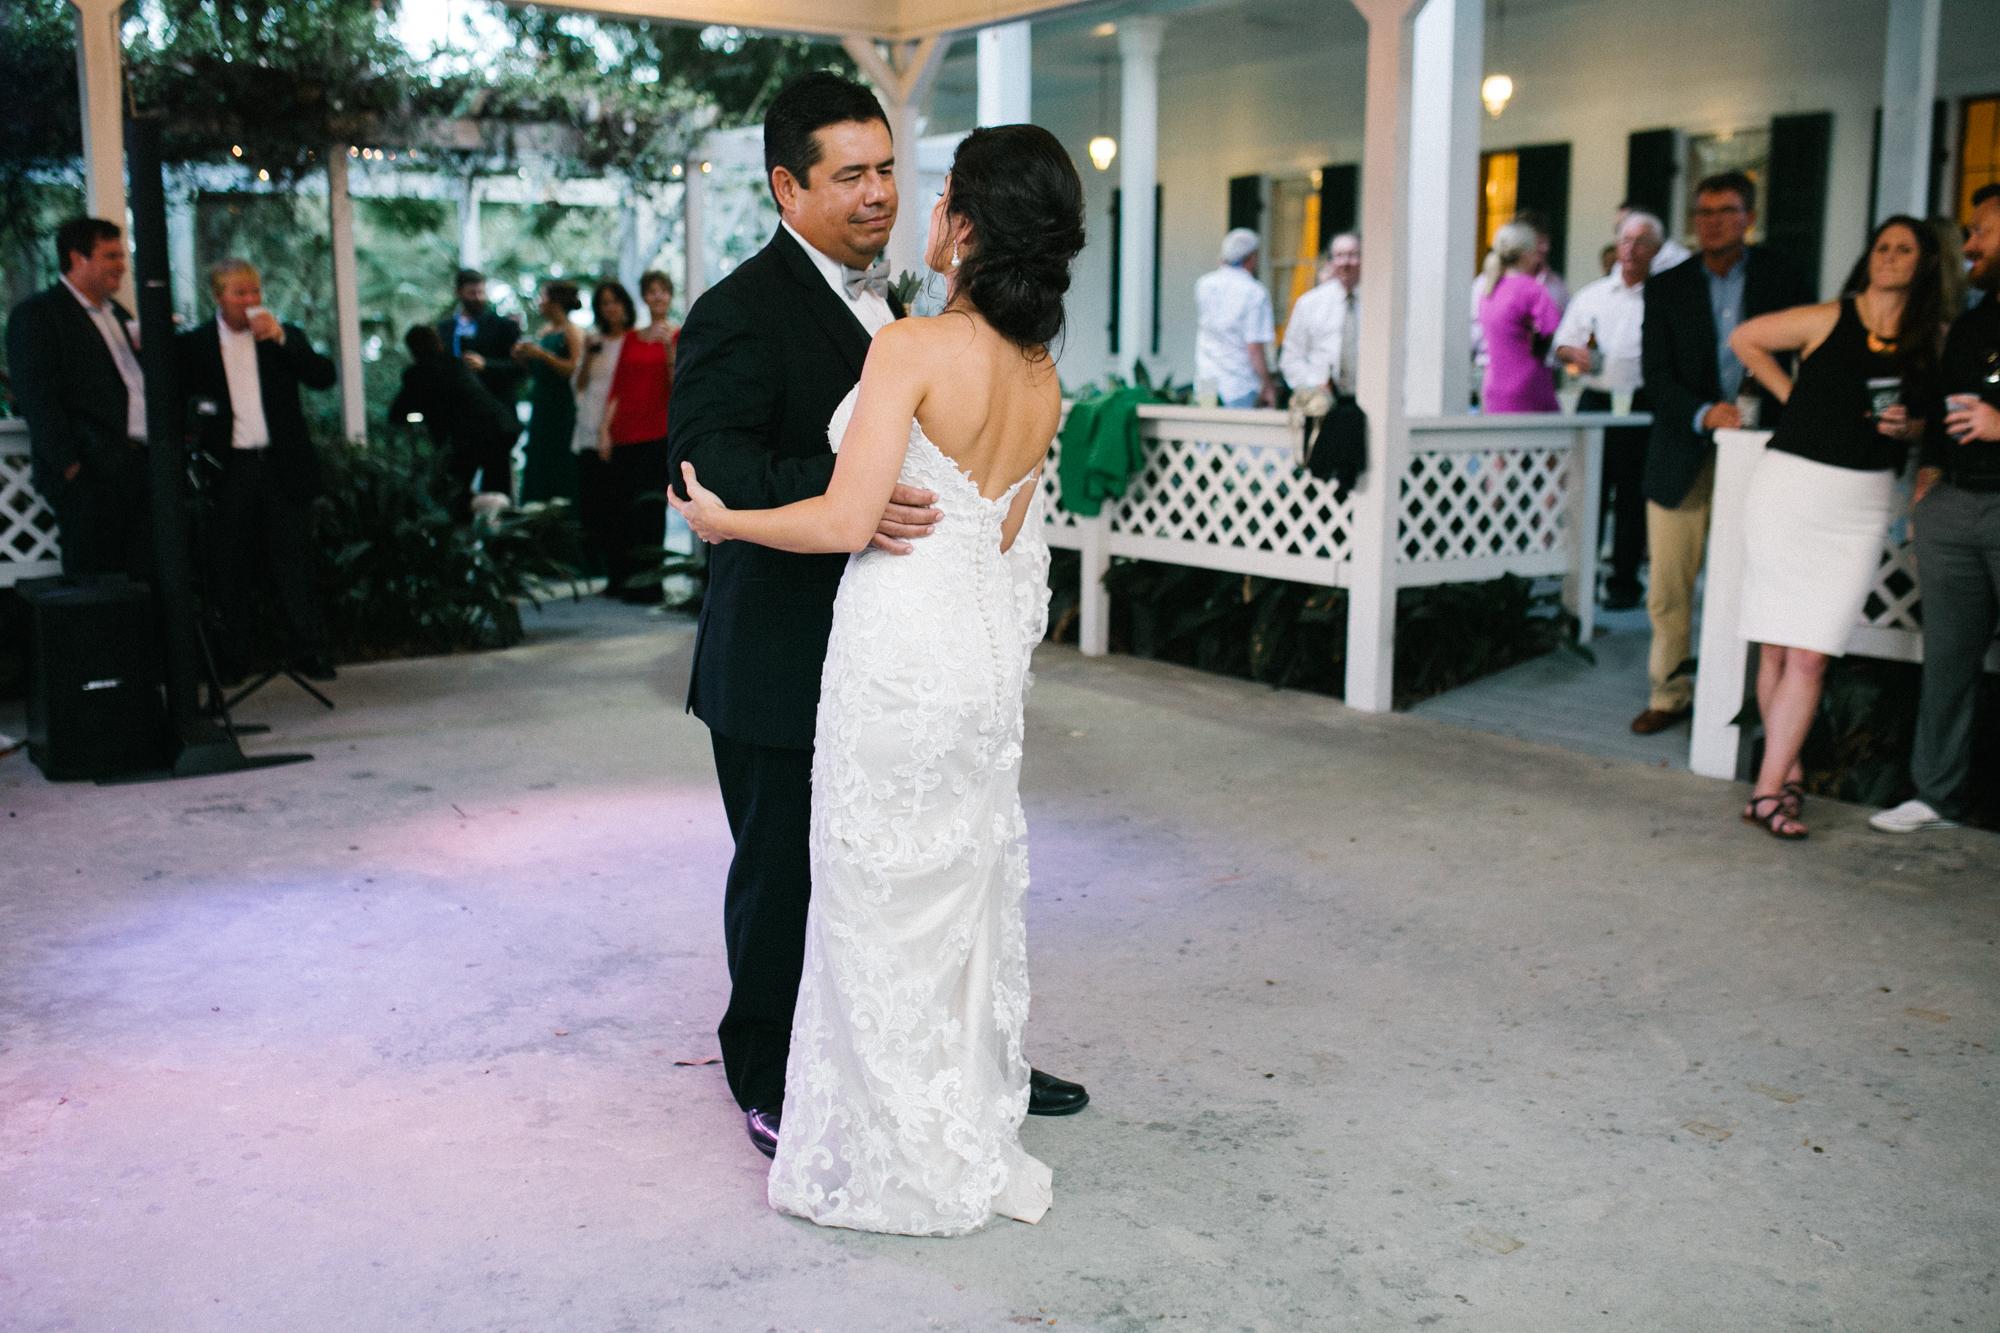 Gautier_Wedding_Photographer-178.jpg